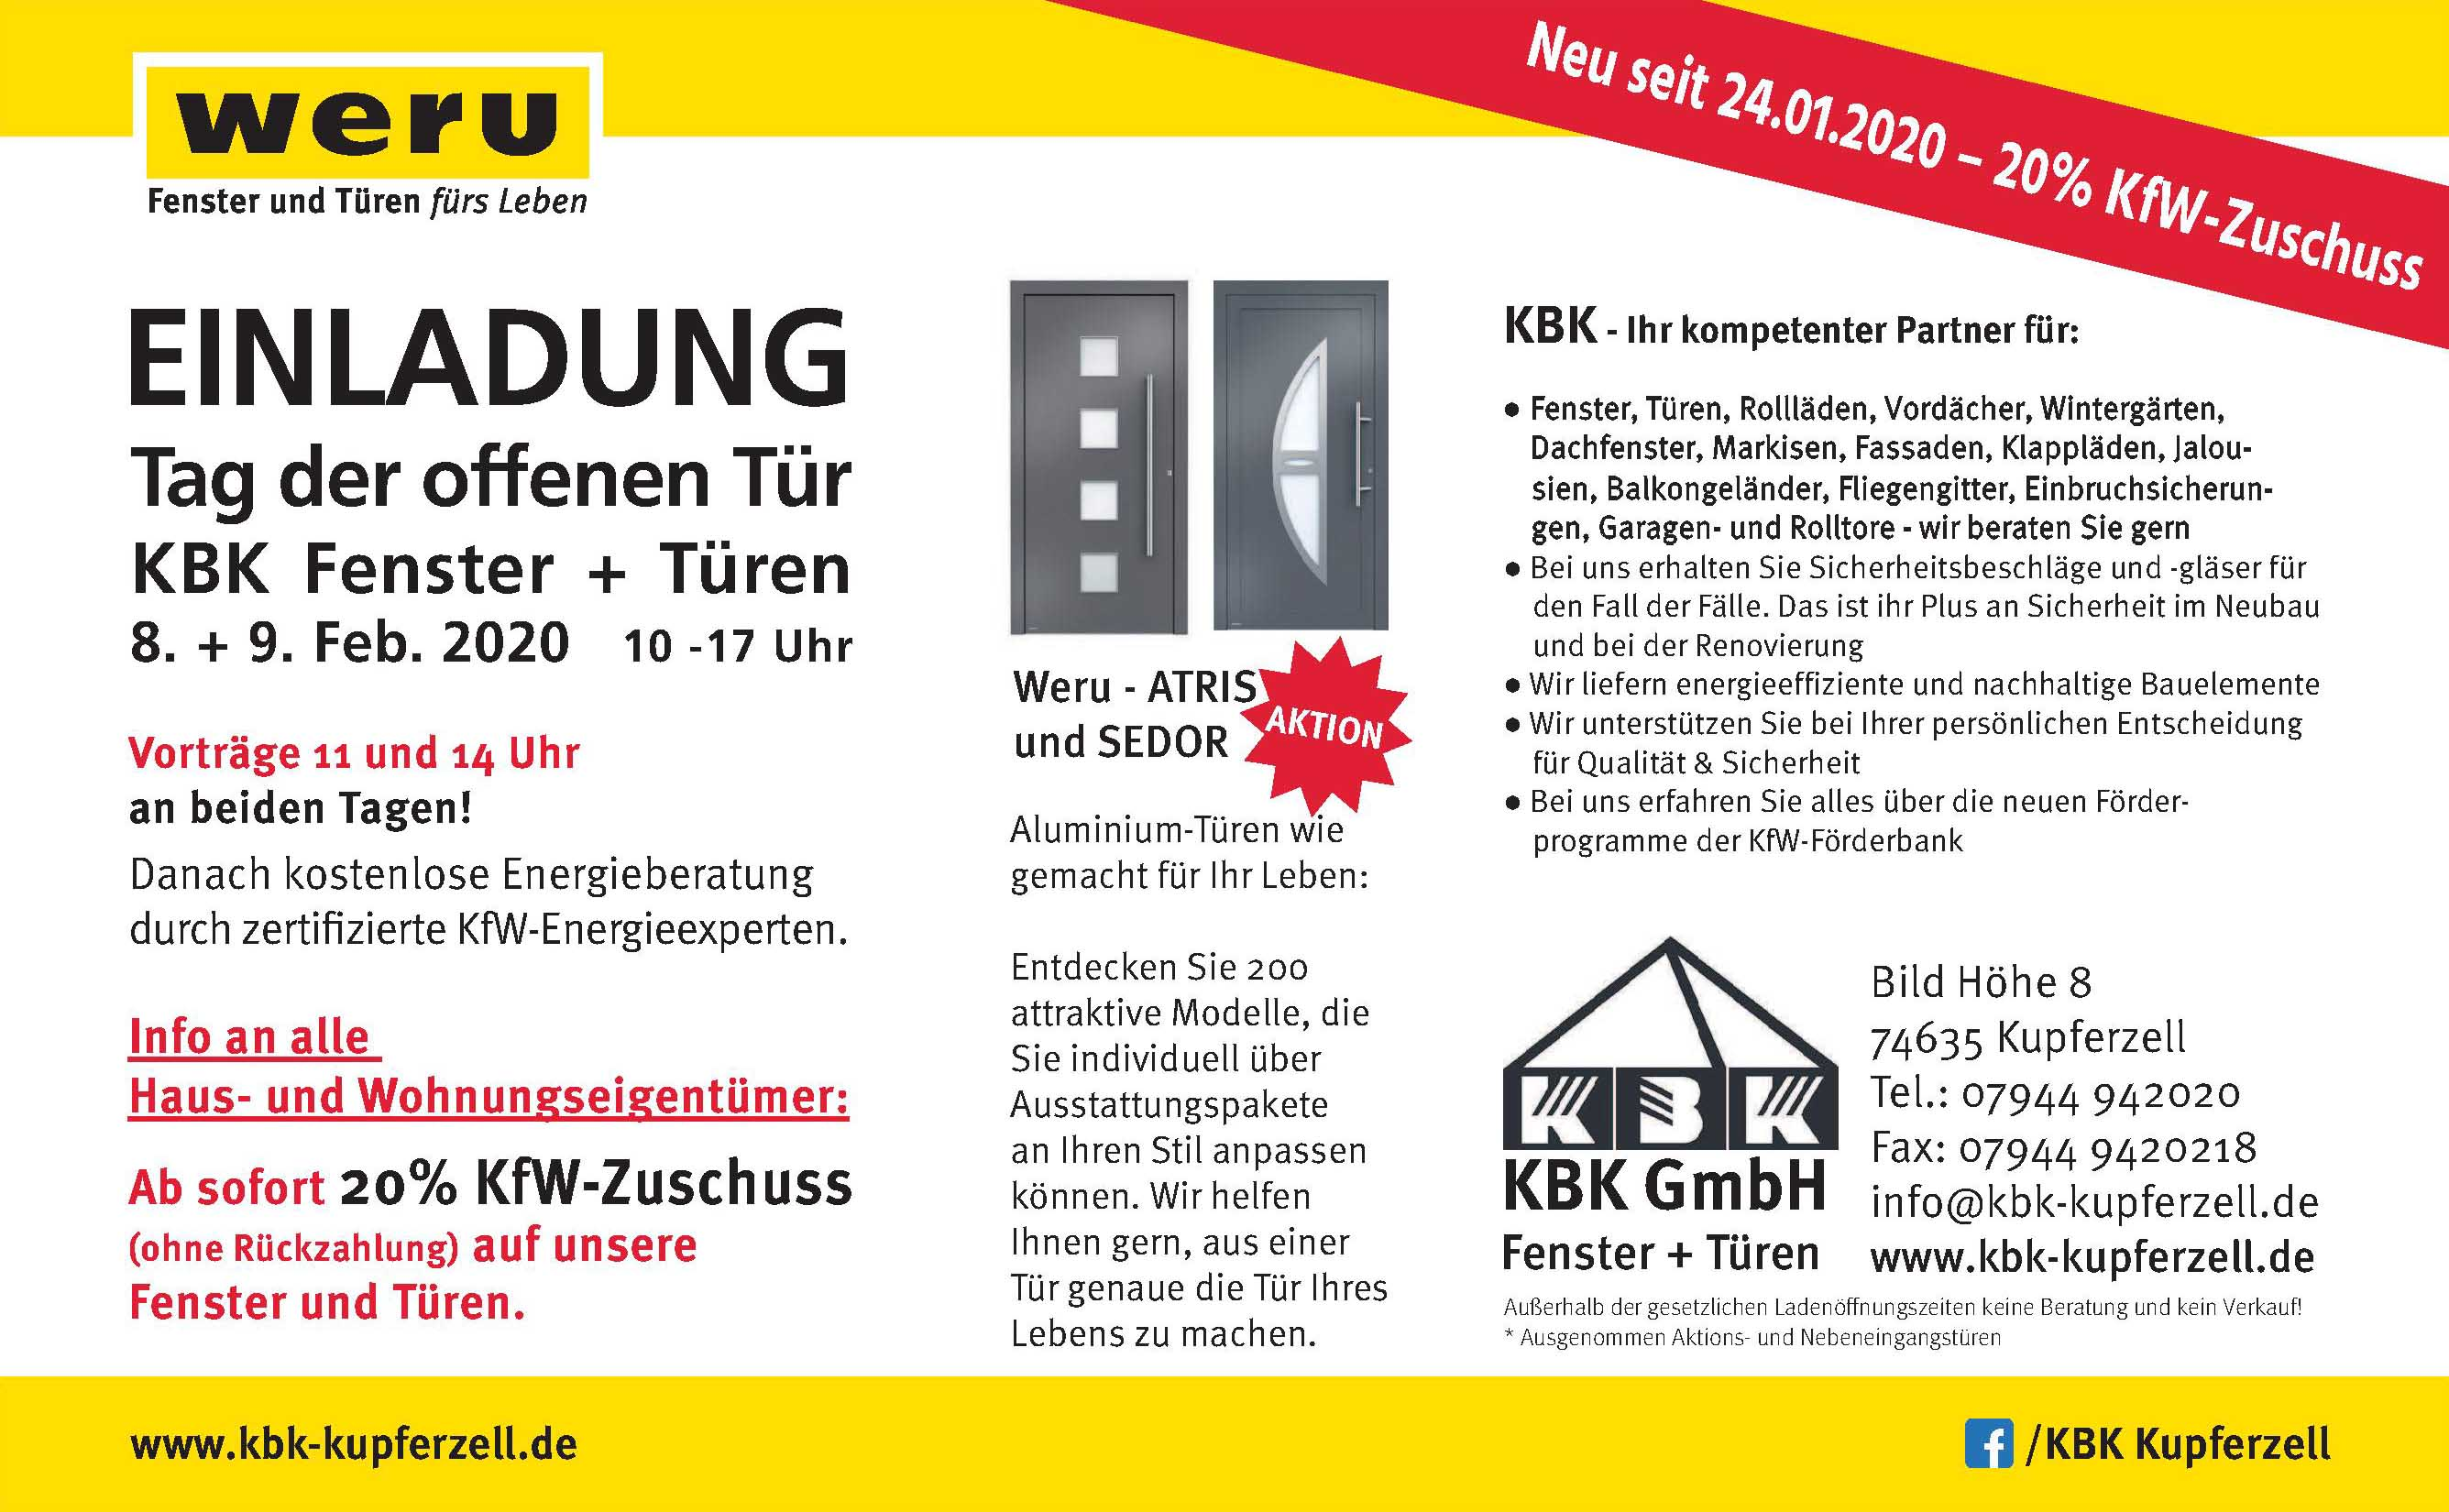 KBK GmbH